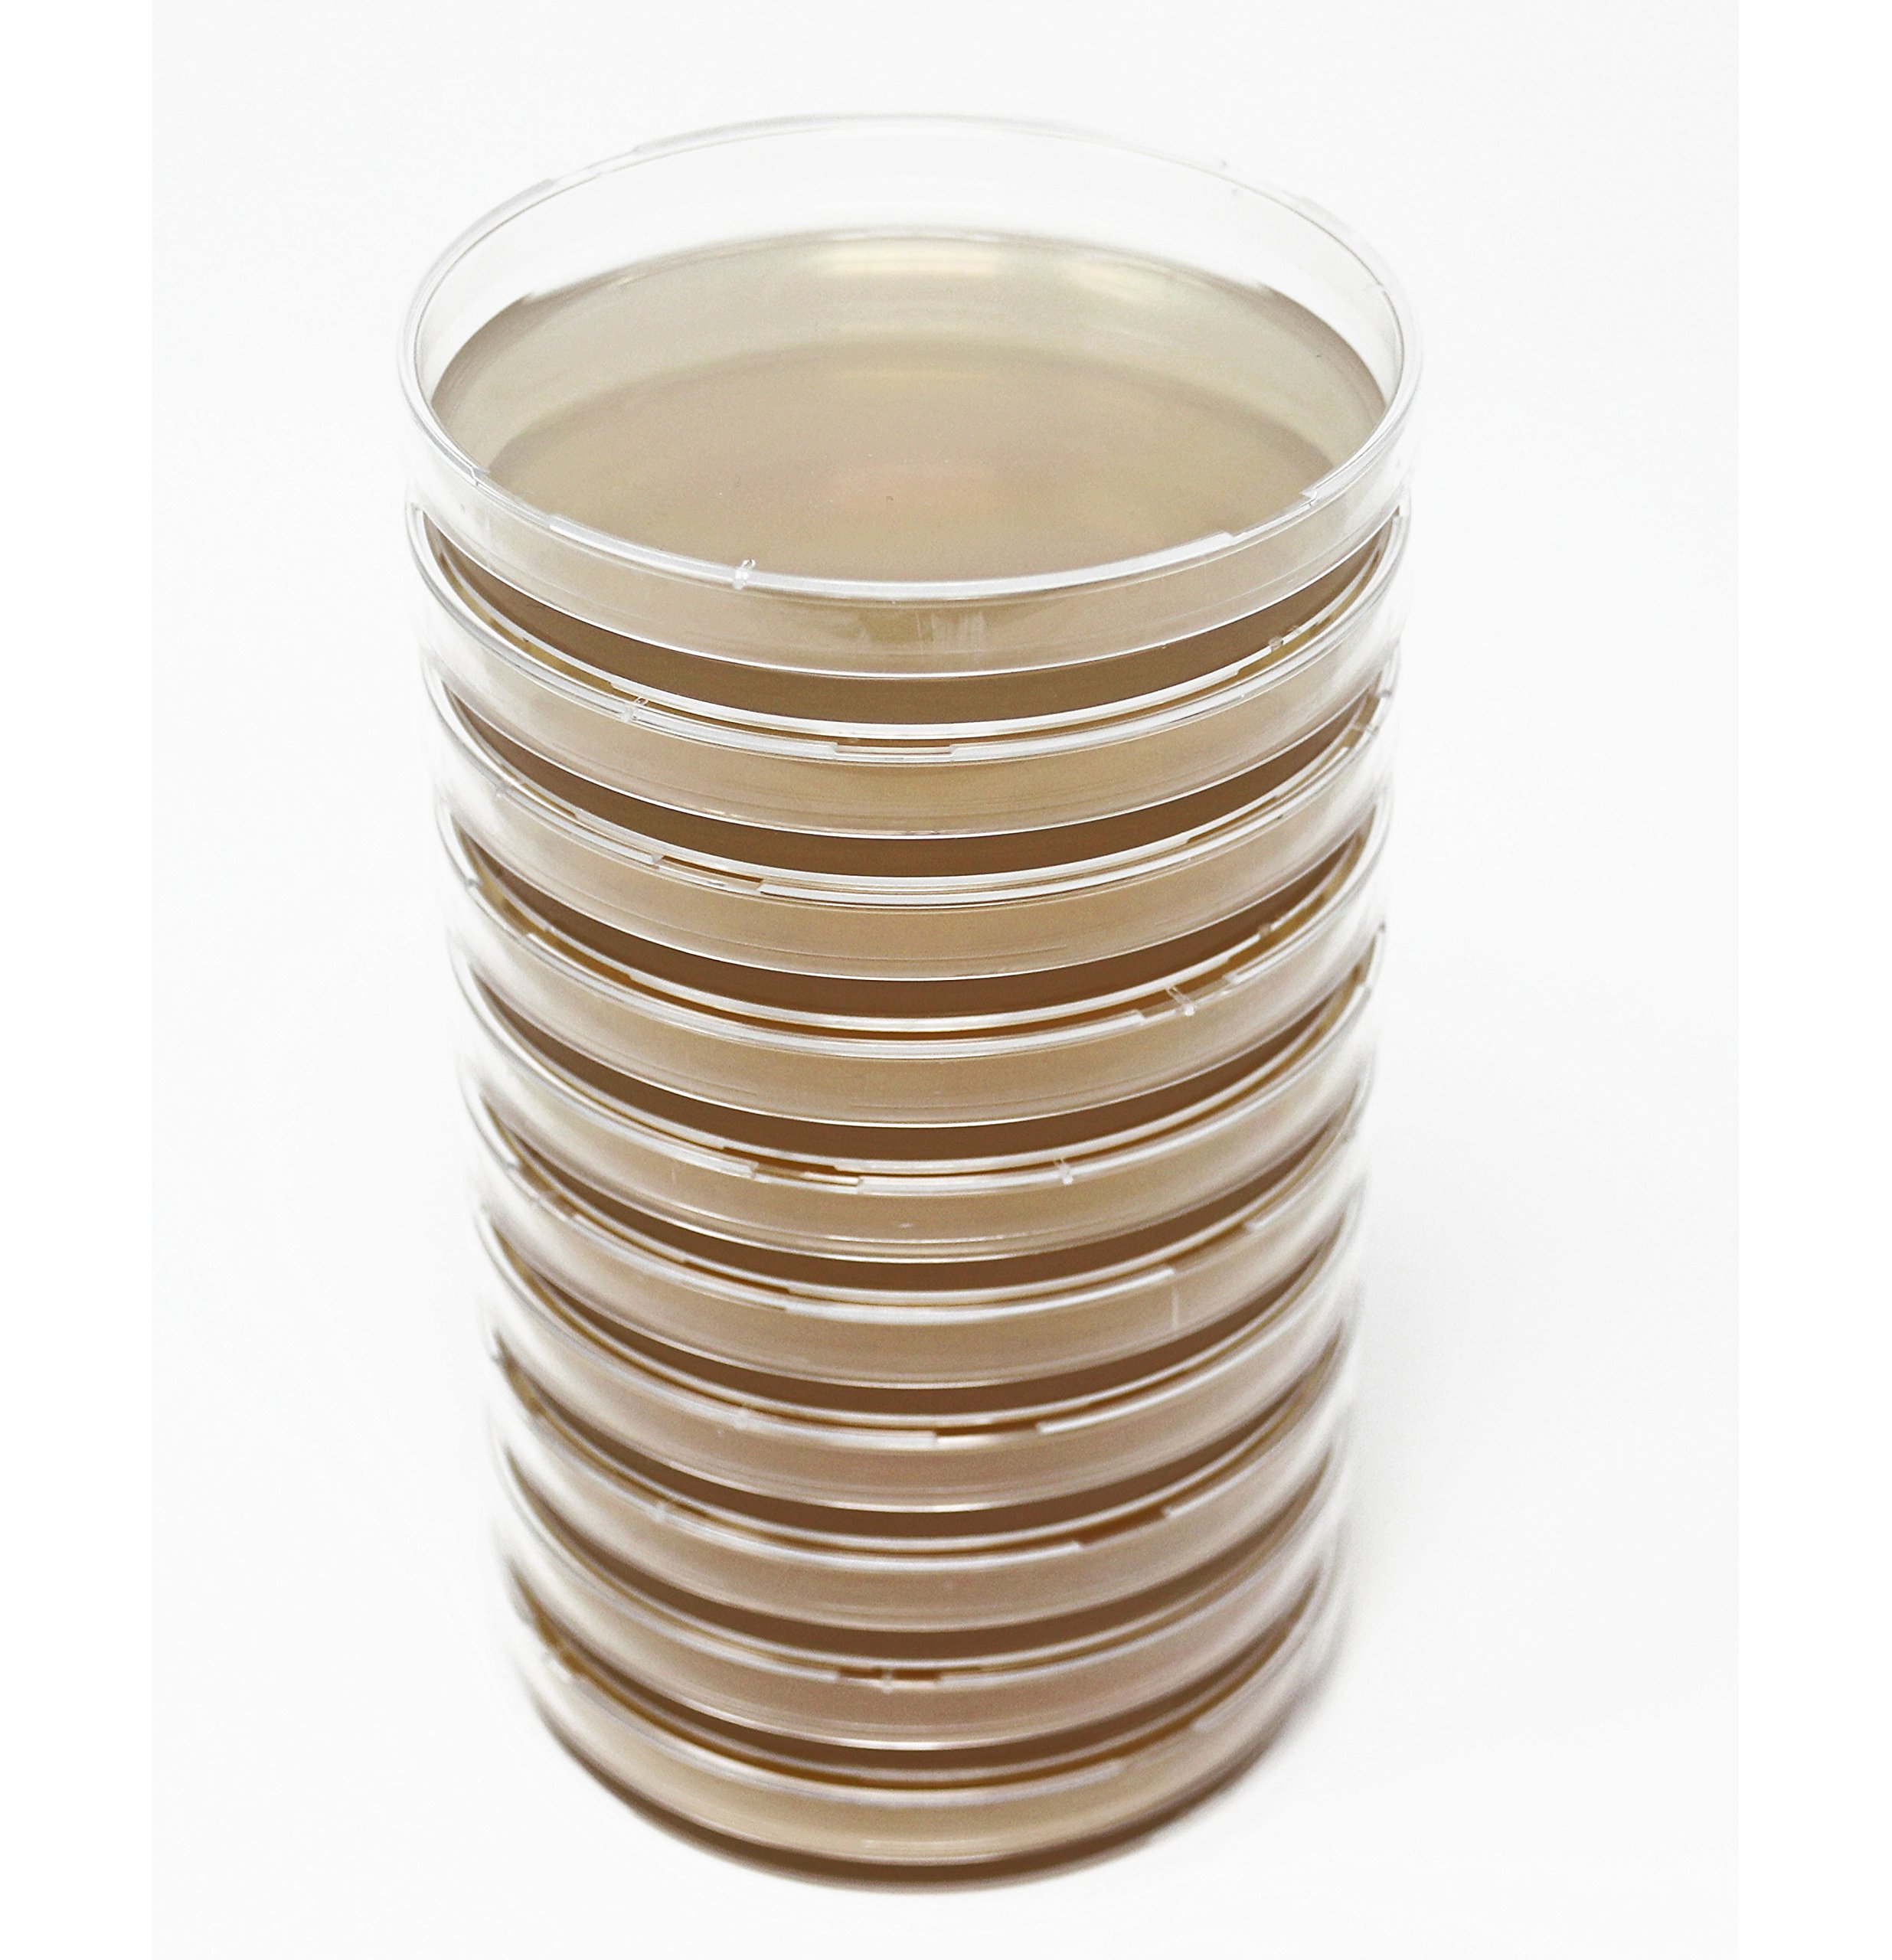 EZ BioResearch Malt Extract Agar (MEA) Plates for Mushroom Cultivation (10 Prepoured Agar Plates) by EZ BioResearch